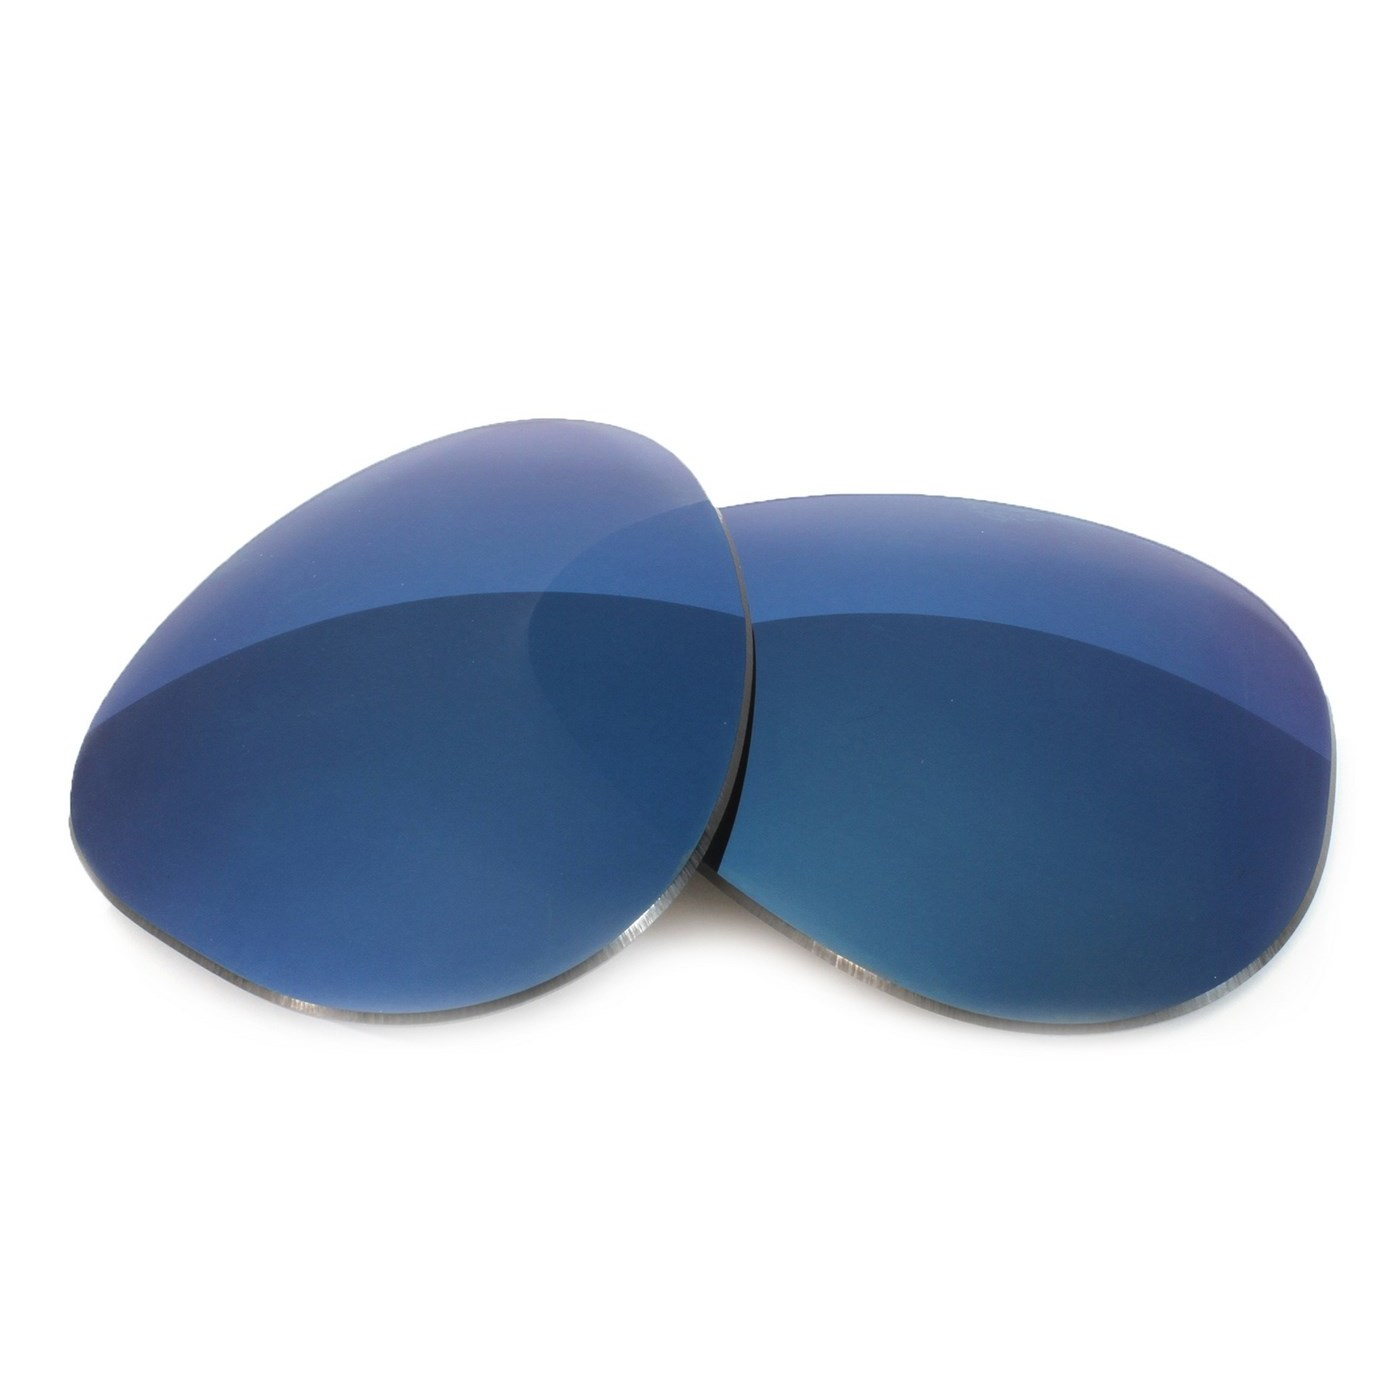 Plus Replacement Lenses for Maui Jim Ocean MJ-723 Fuse Lenses Fuse